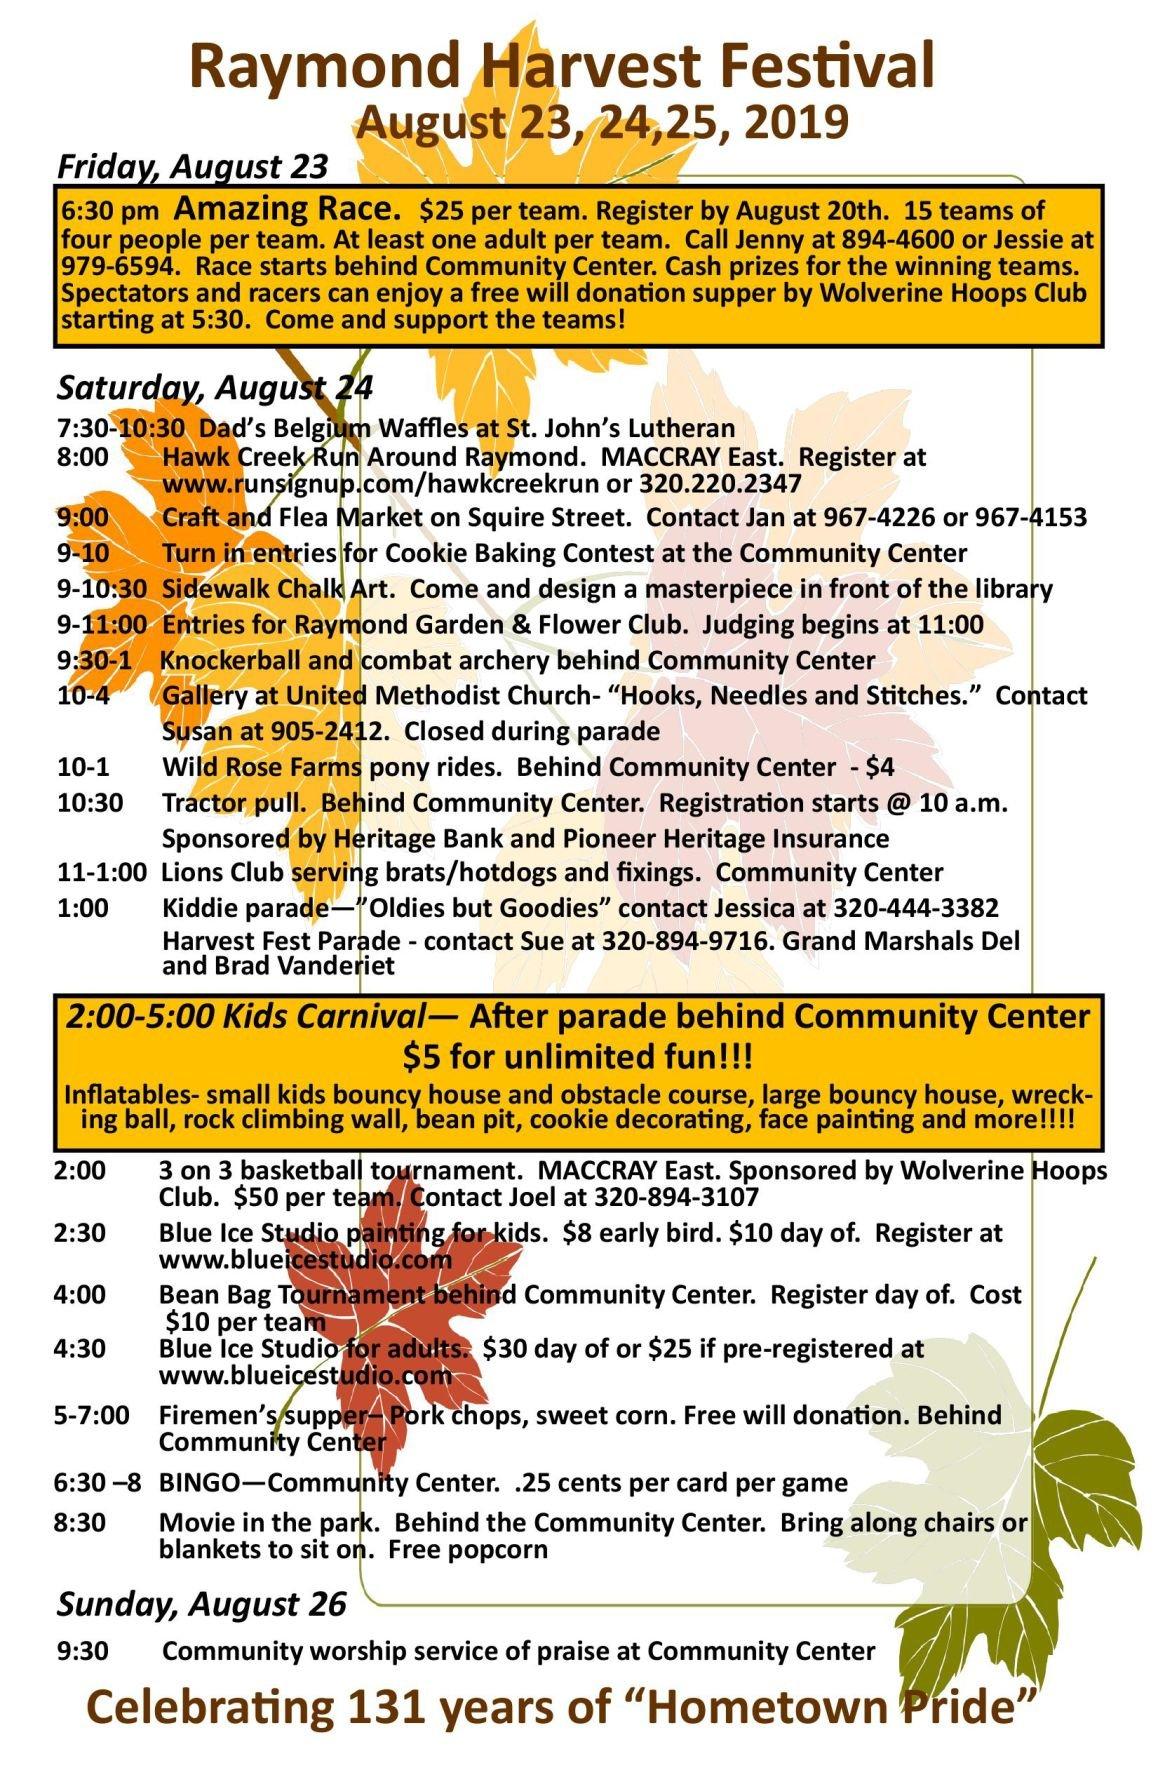 Raymond Harvest Festival Schedule 2019